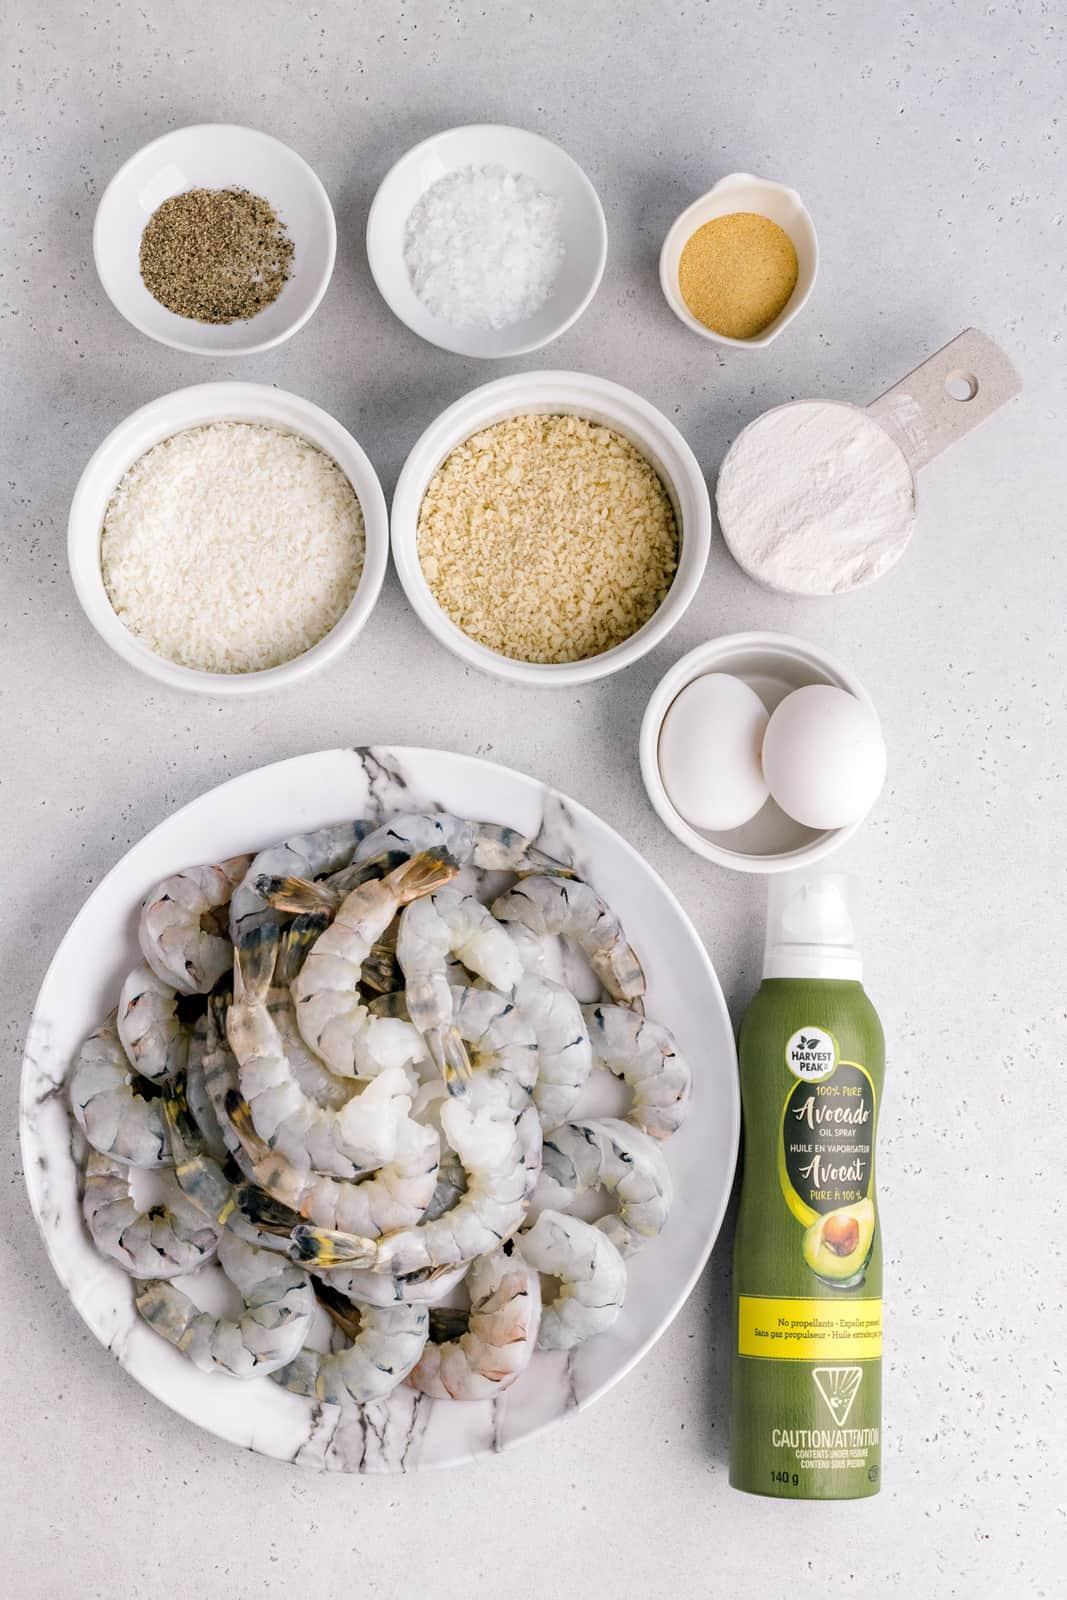 Ingredients needed to make Air Fryer Coconut Shrimp